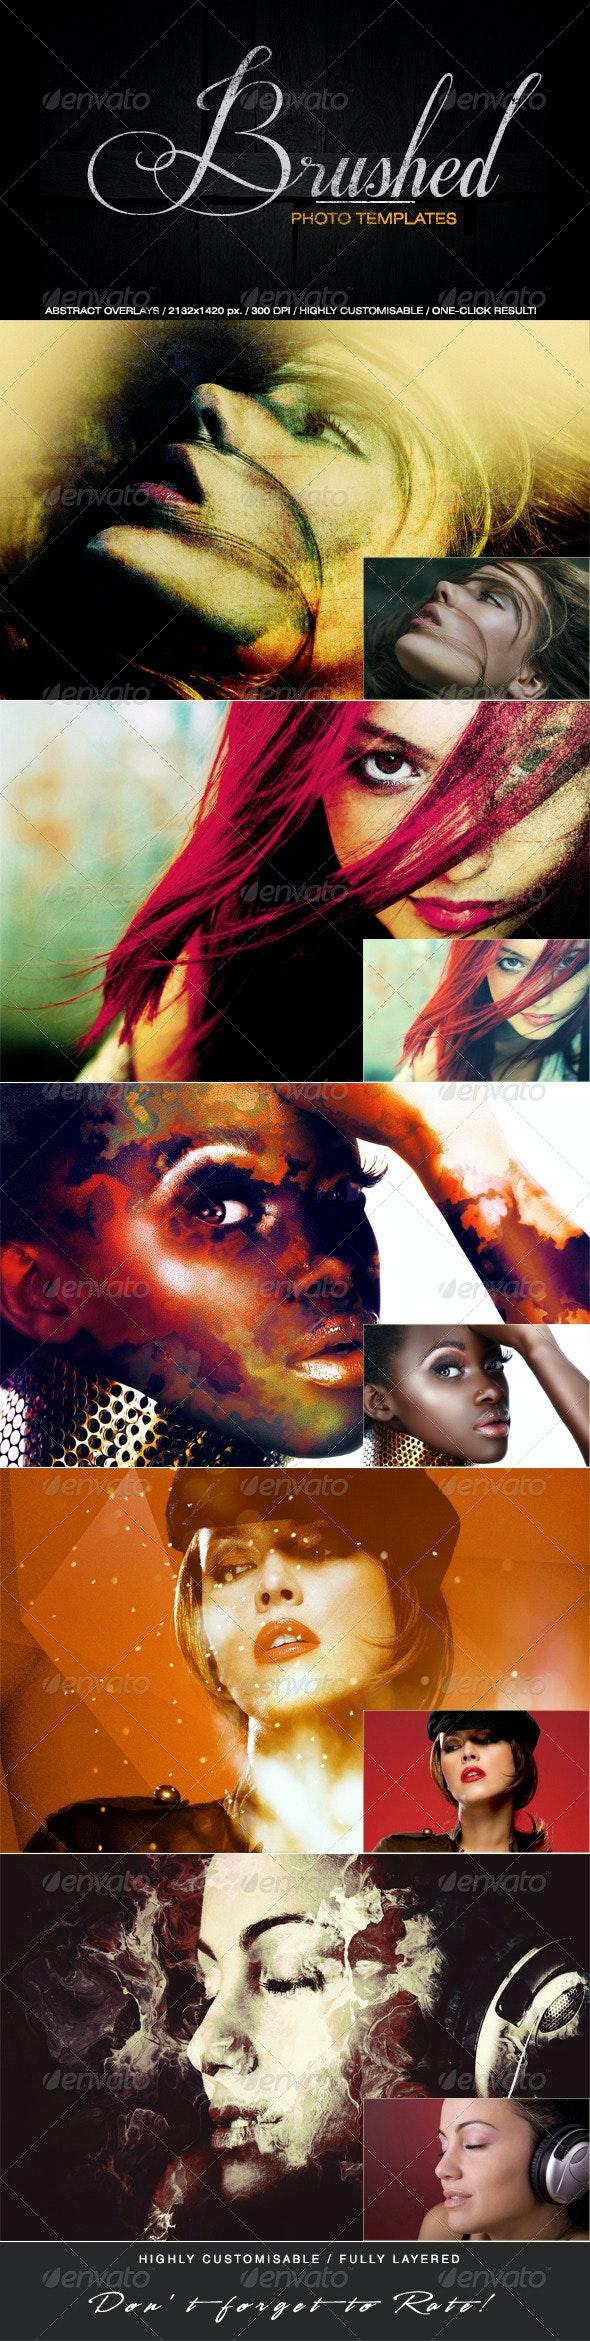 Brushed Photo Templates - Artistic Photo Templates